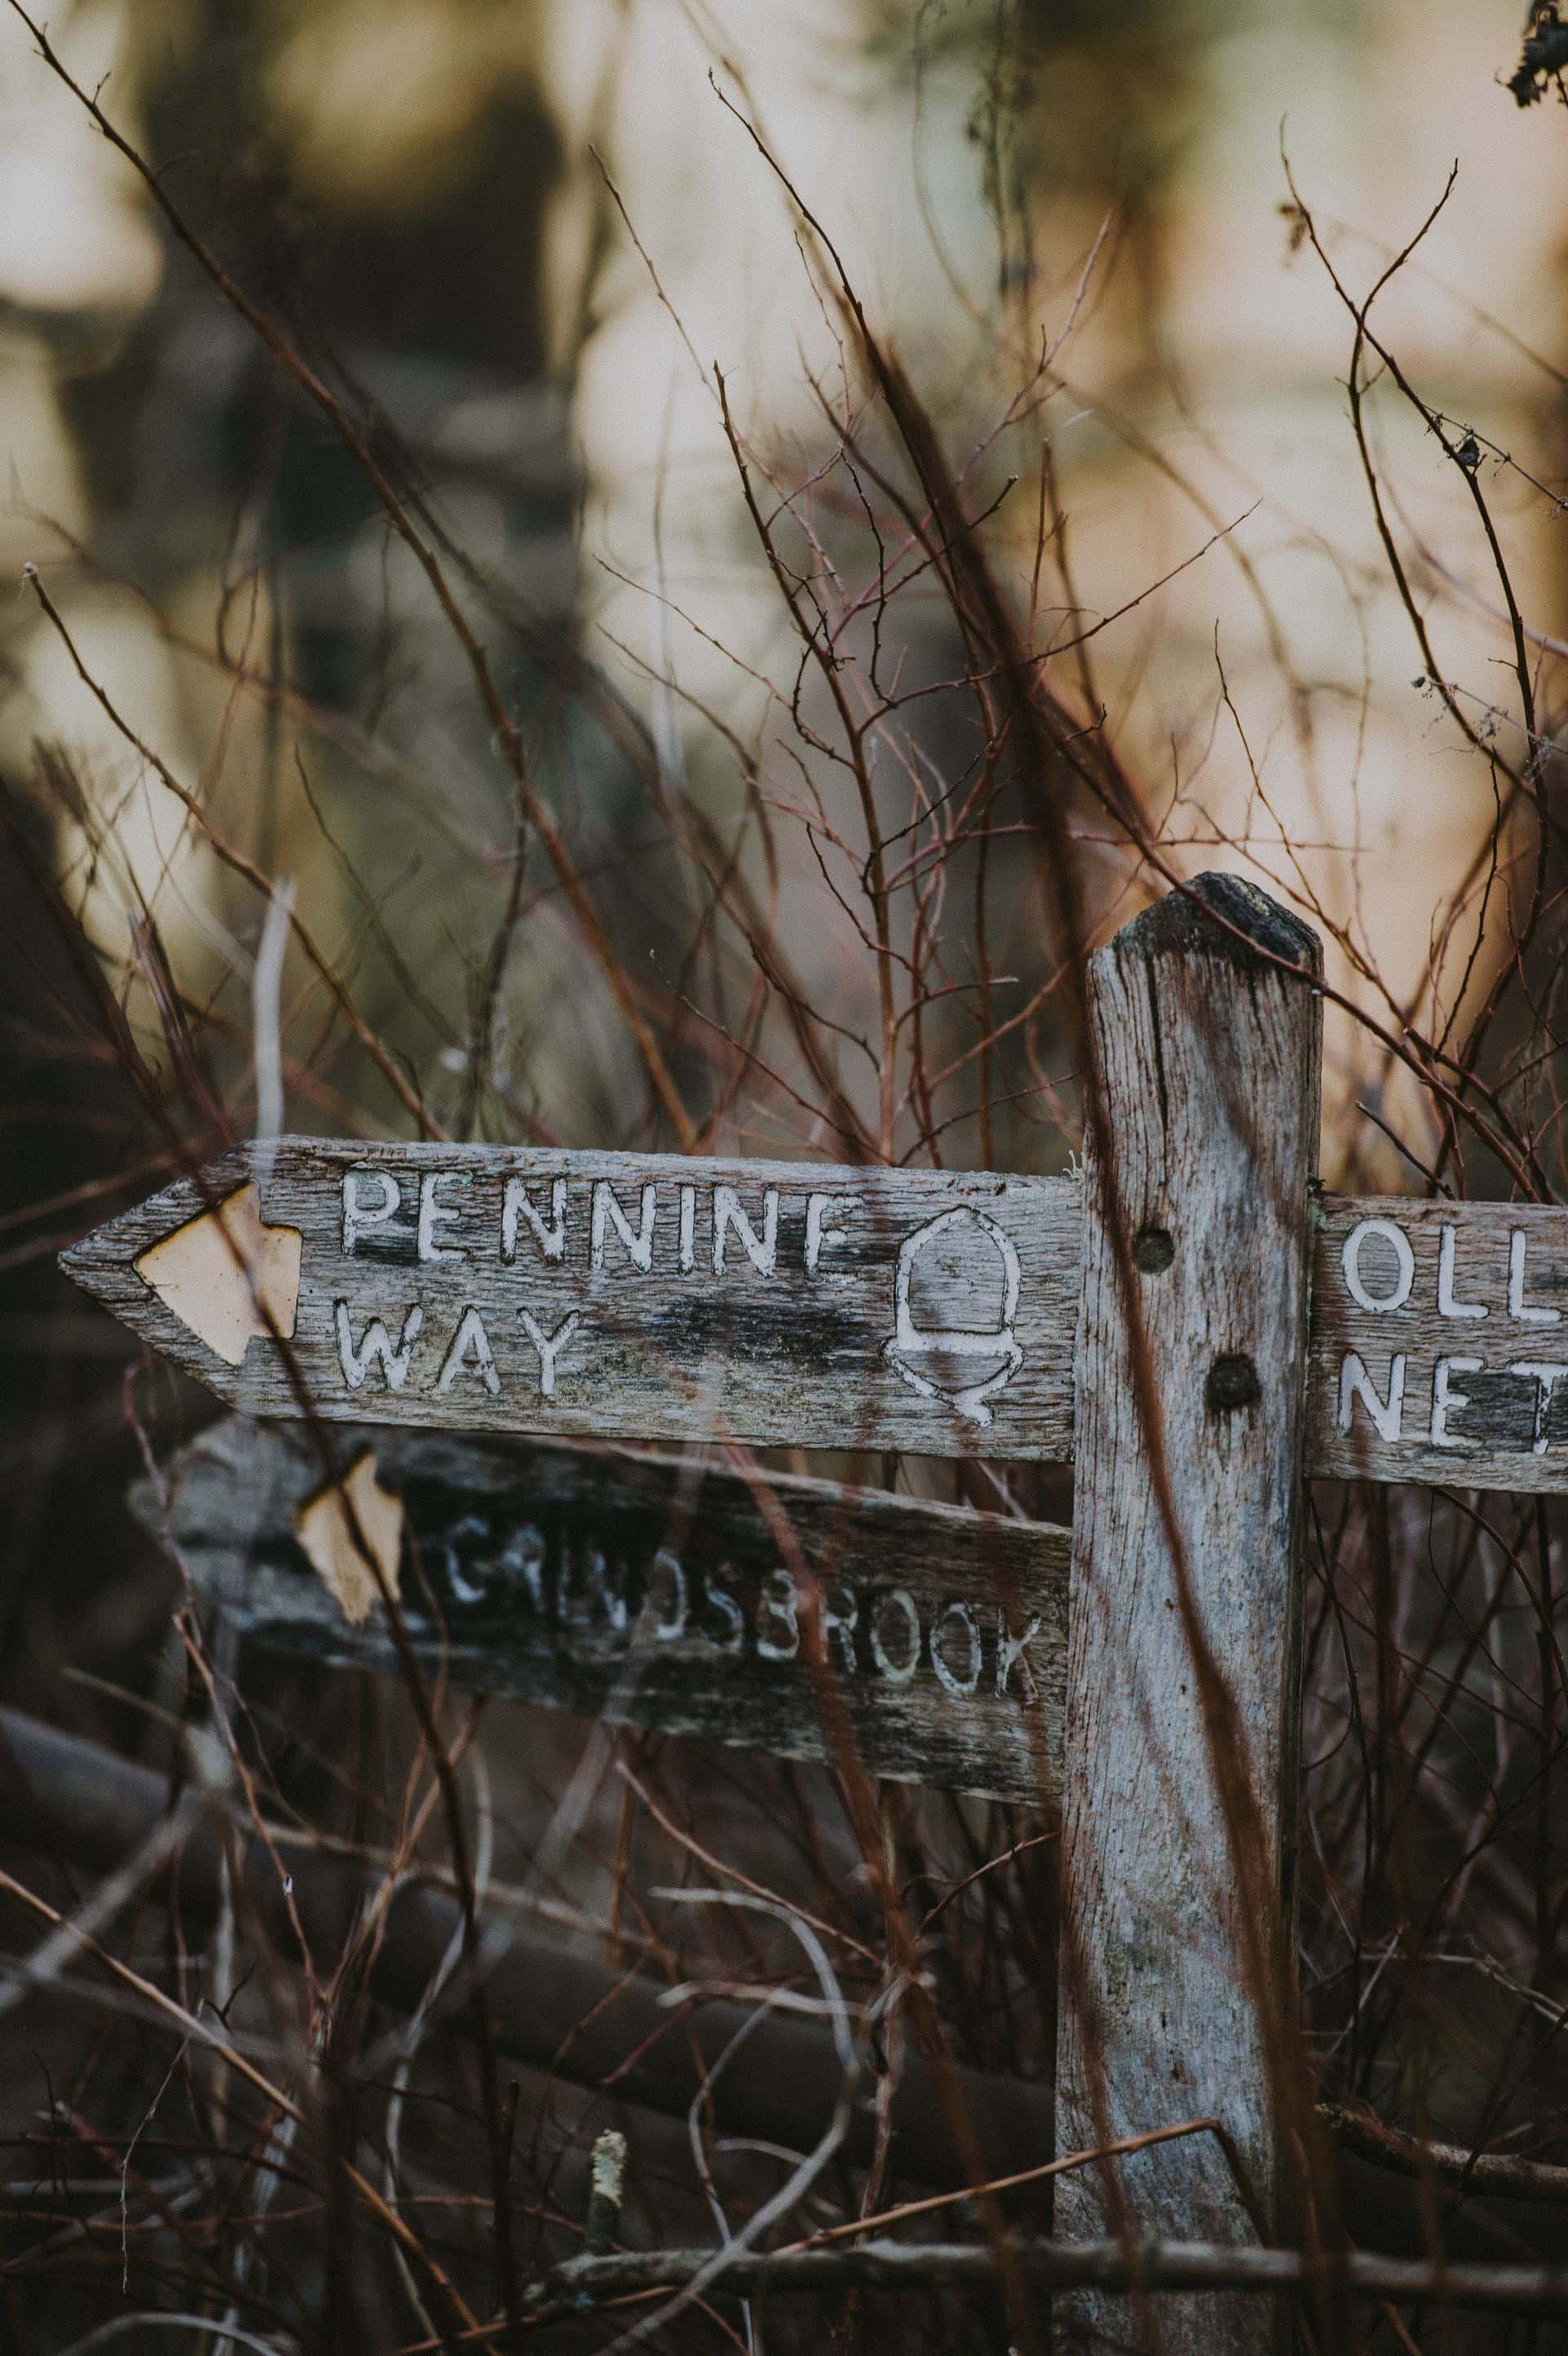 Pennine Way- Montane Spine Race